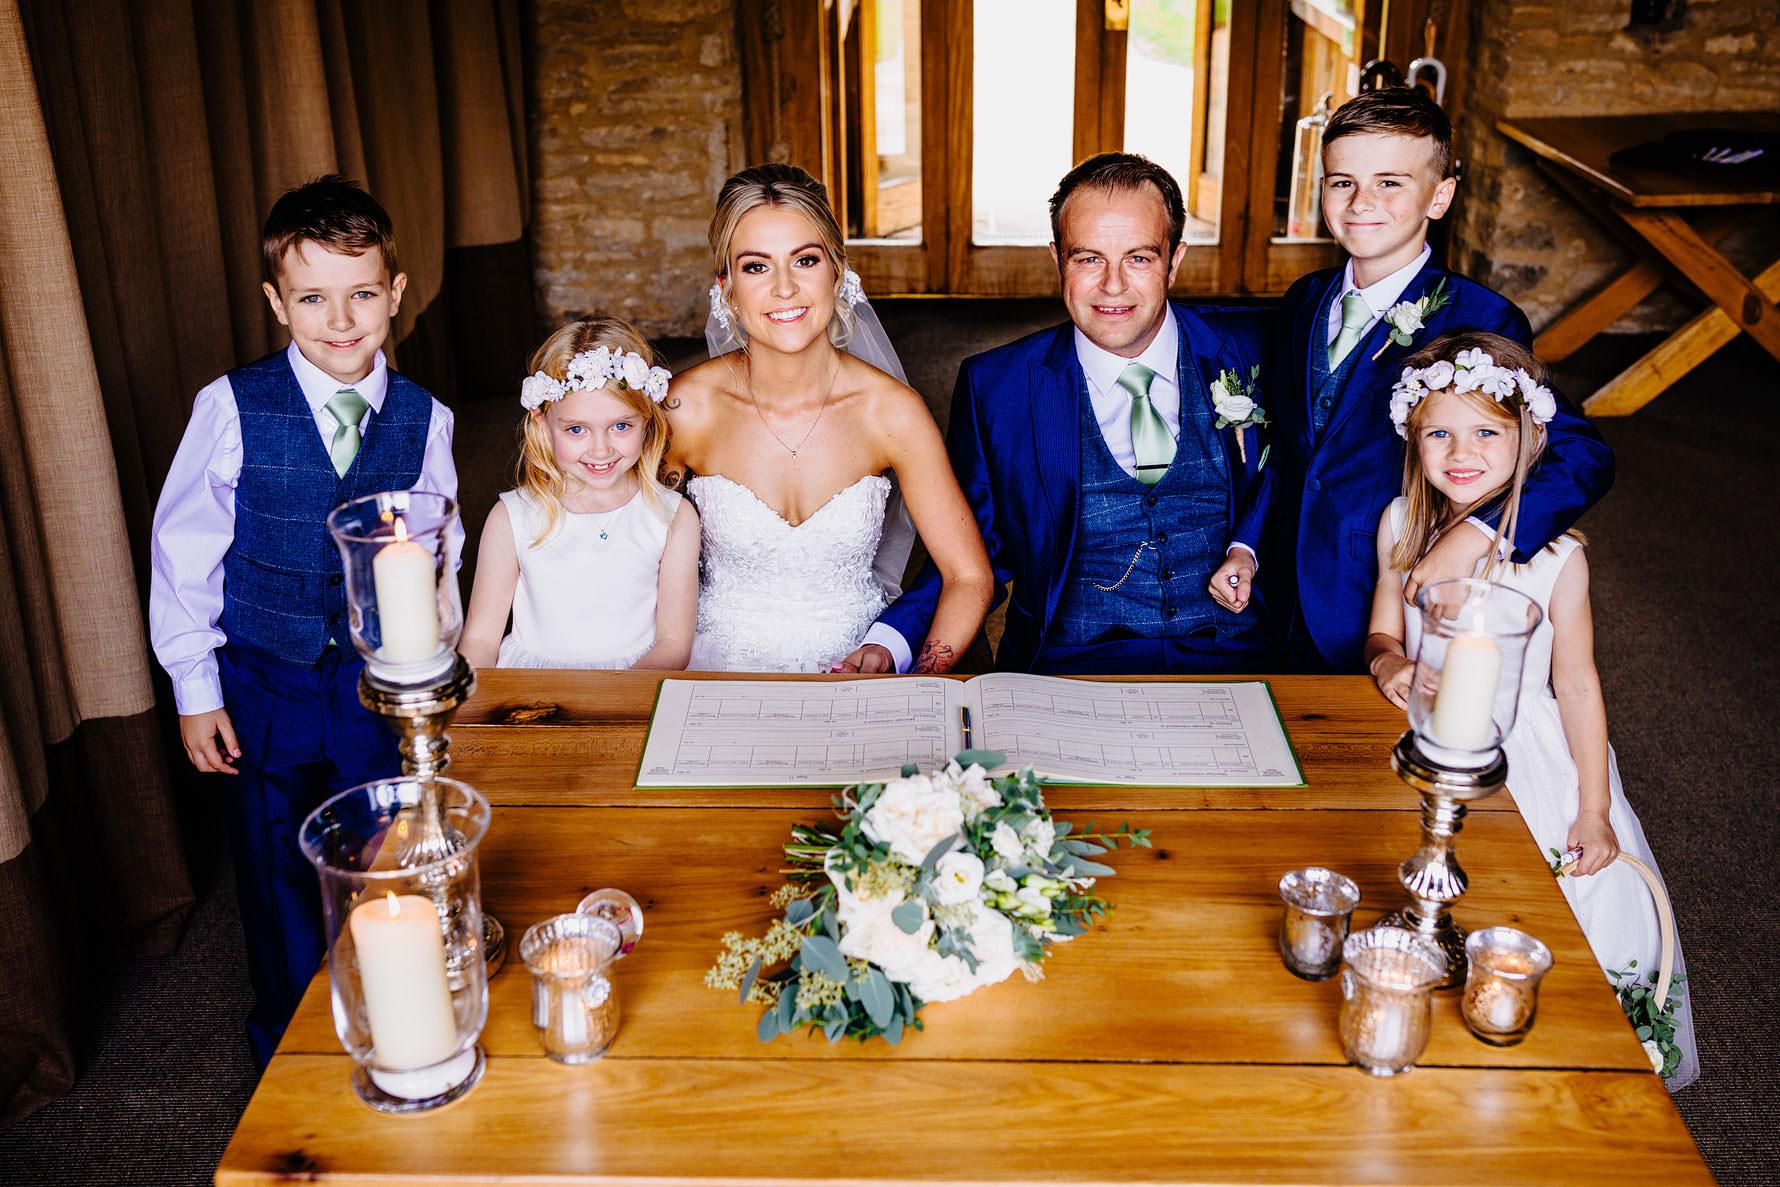 a family wedding image